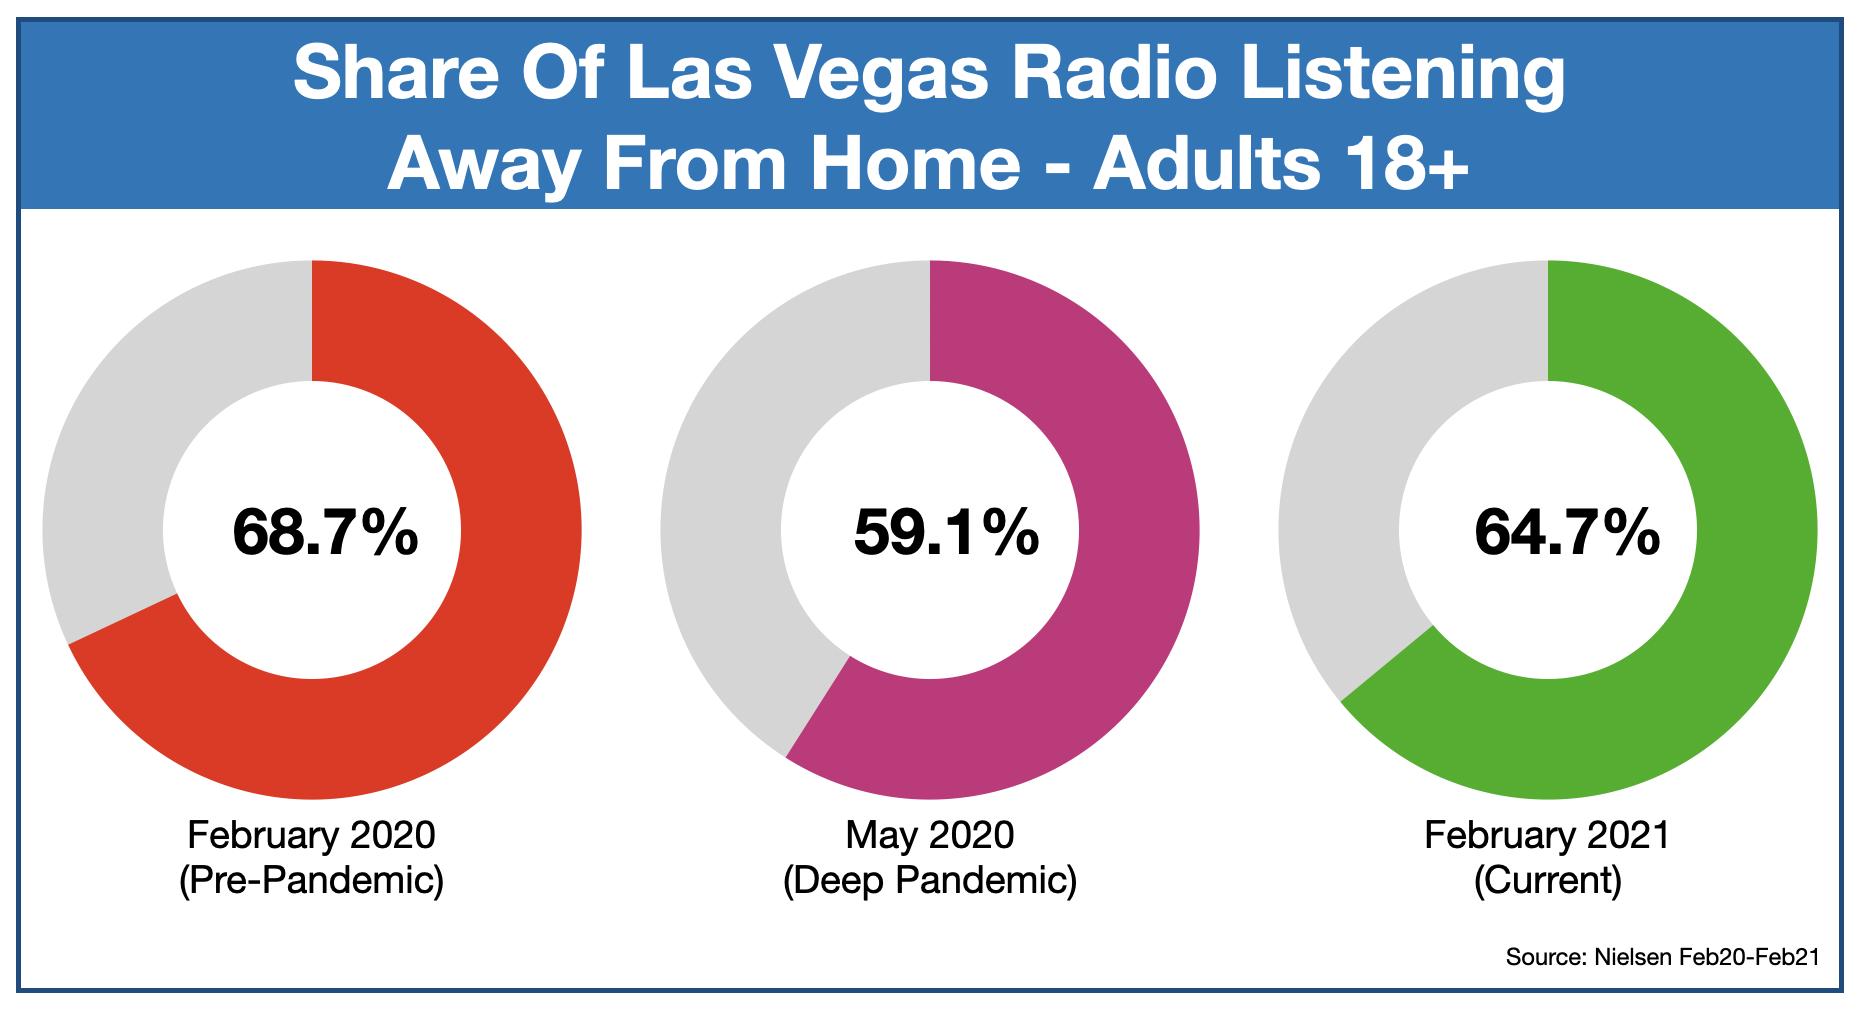 Advertising On Las Vegas Radio Listening Locations